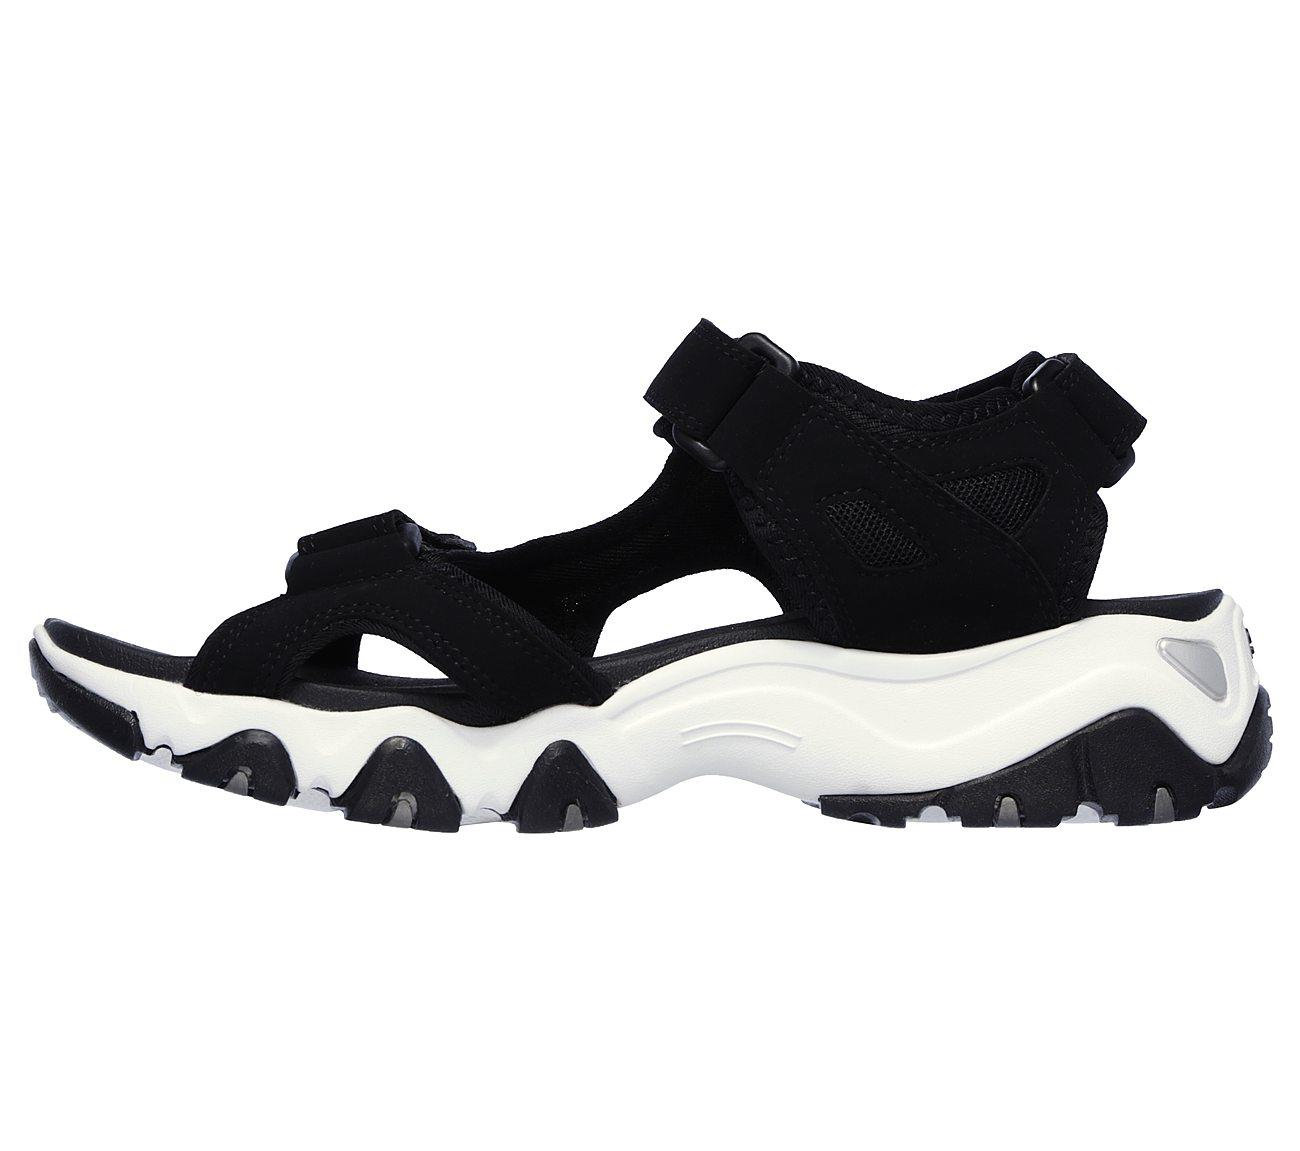 Mujer joven público Inyección  Buy SKECHERS D'Lites 2.0 - Kilowatt Casual Wedges Shoes